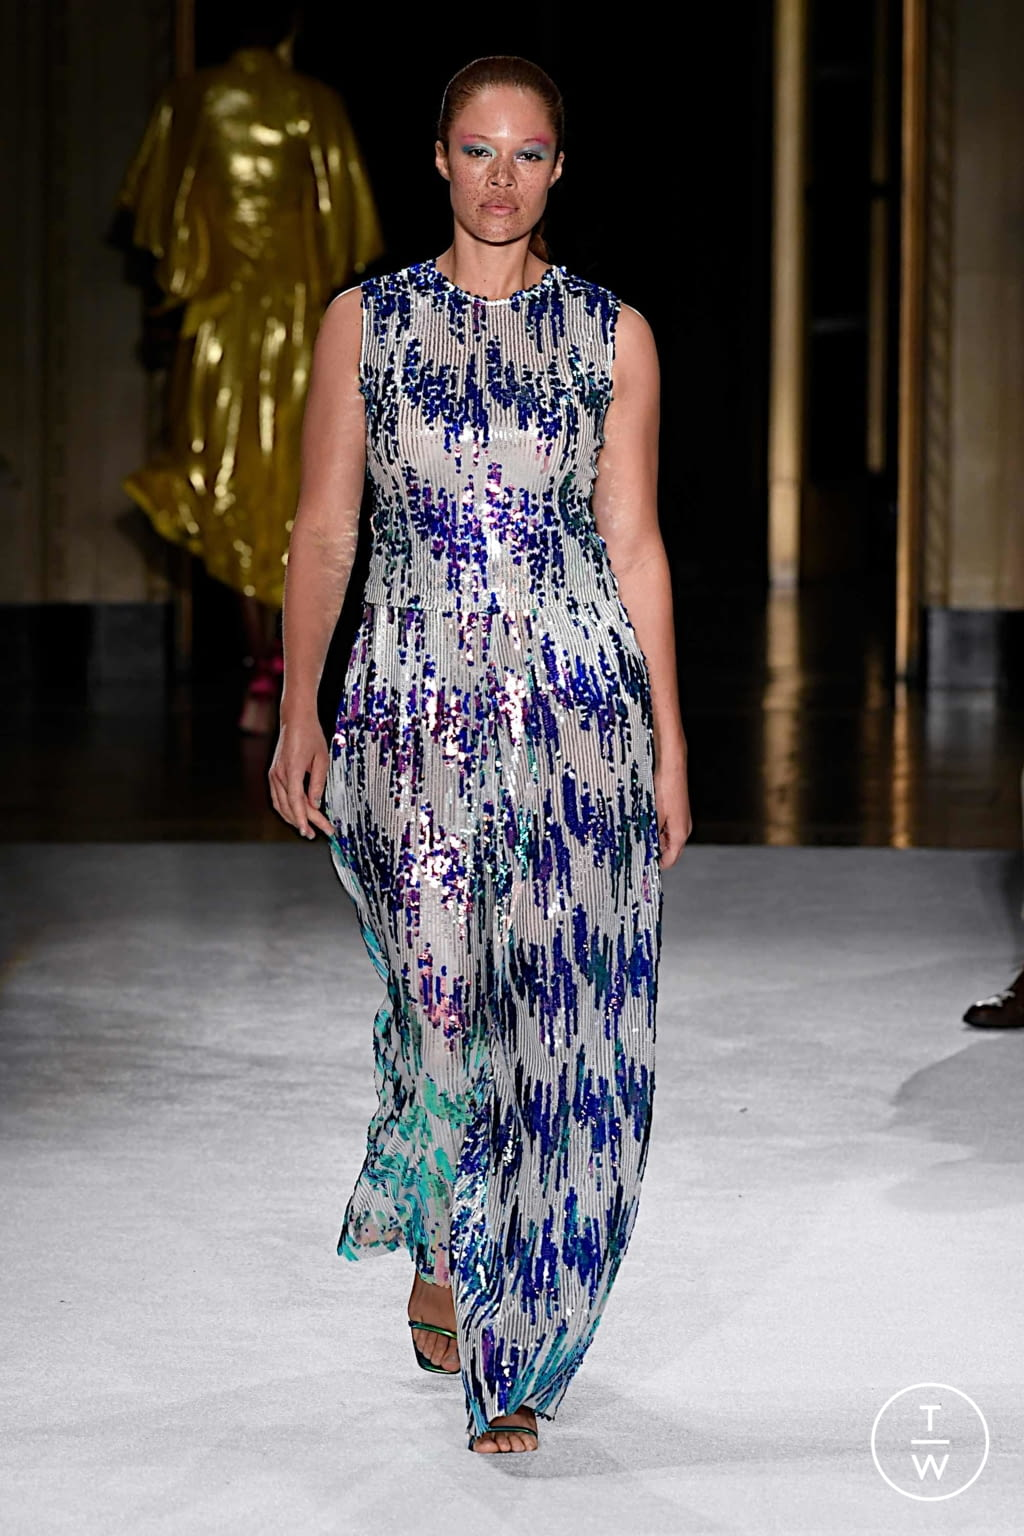 Fashion Week New York Spring/Summer 2020 look 34 de la collection Christian Siriano womenswear